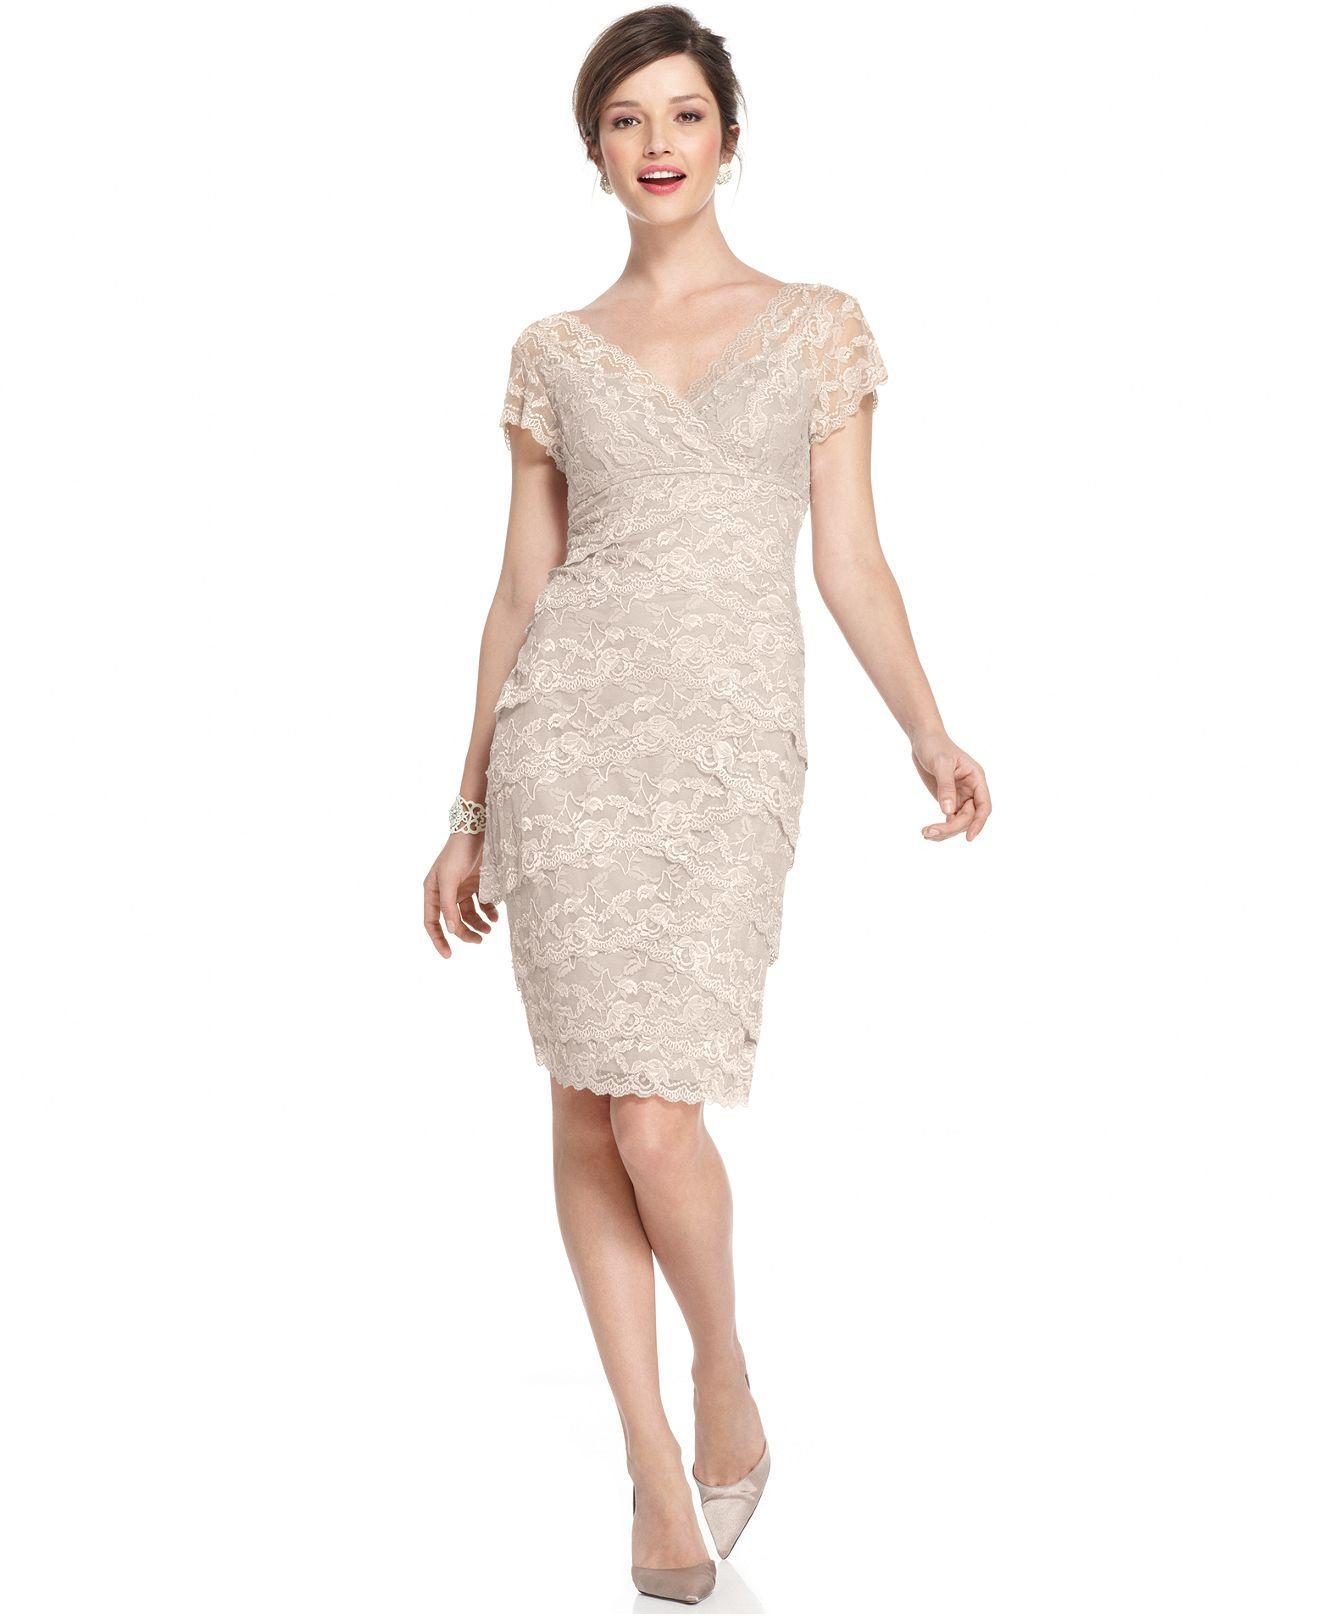 Marina Dress Cap Sleeve Lace Cocktail Dress  Womens Dresses